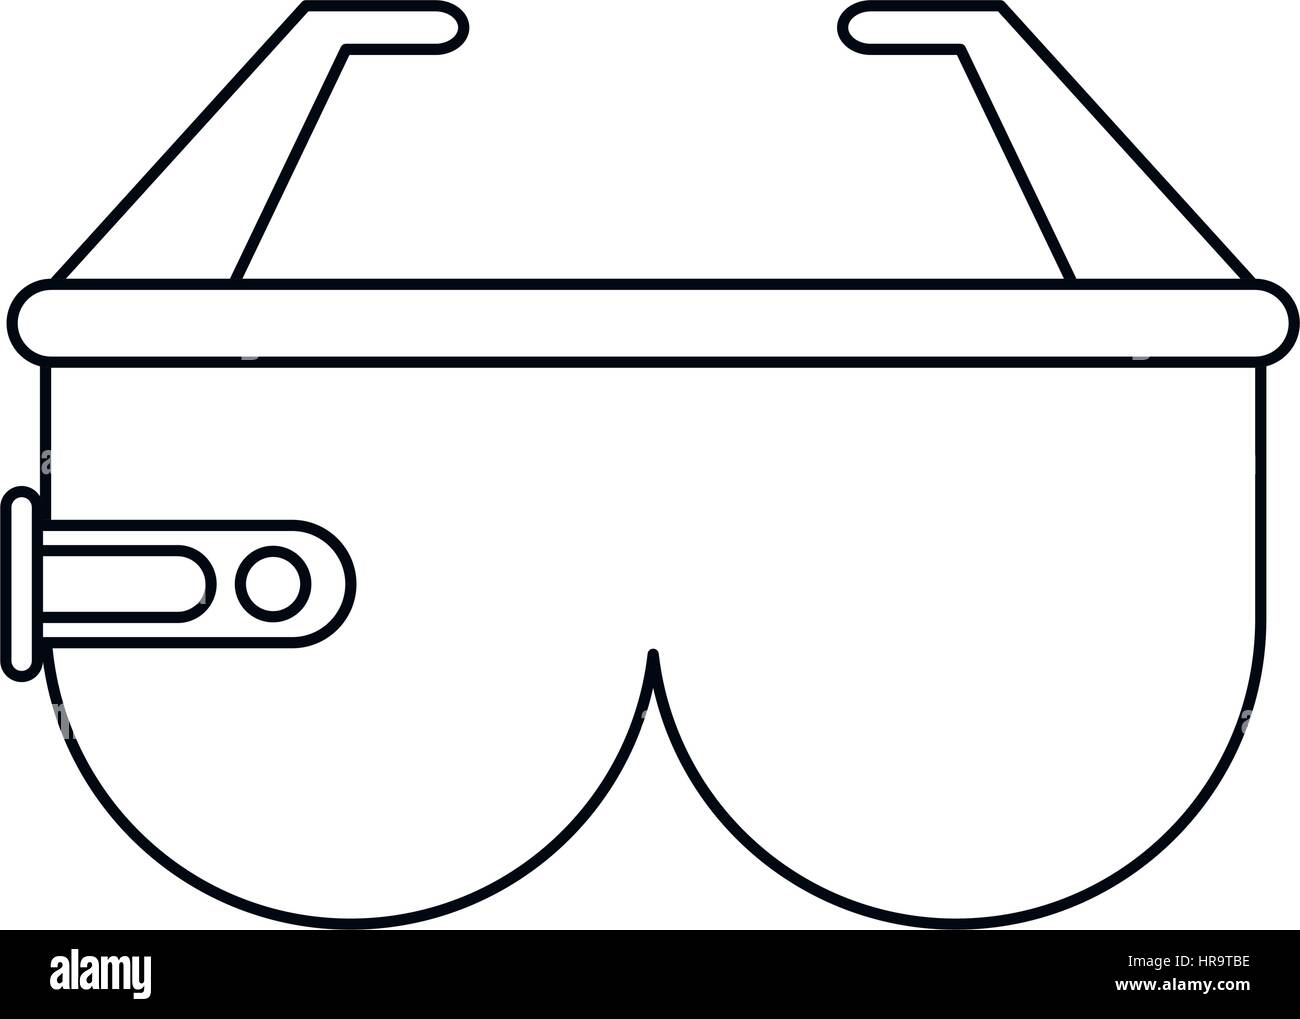 3d Eye Tracking Glasses Stock Photos & 3d Eye Tracking